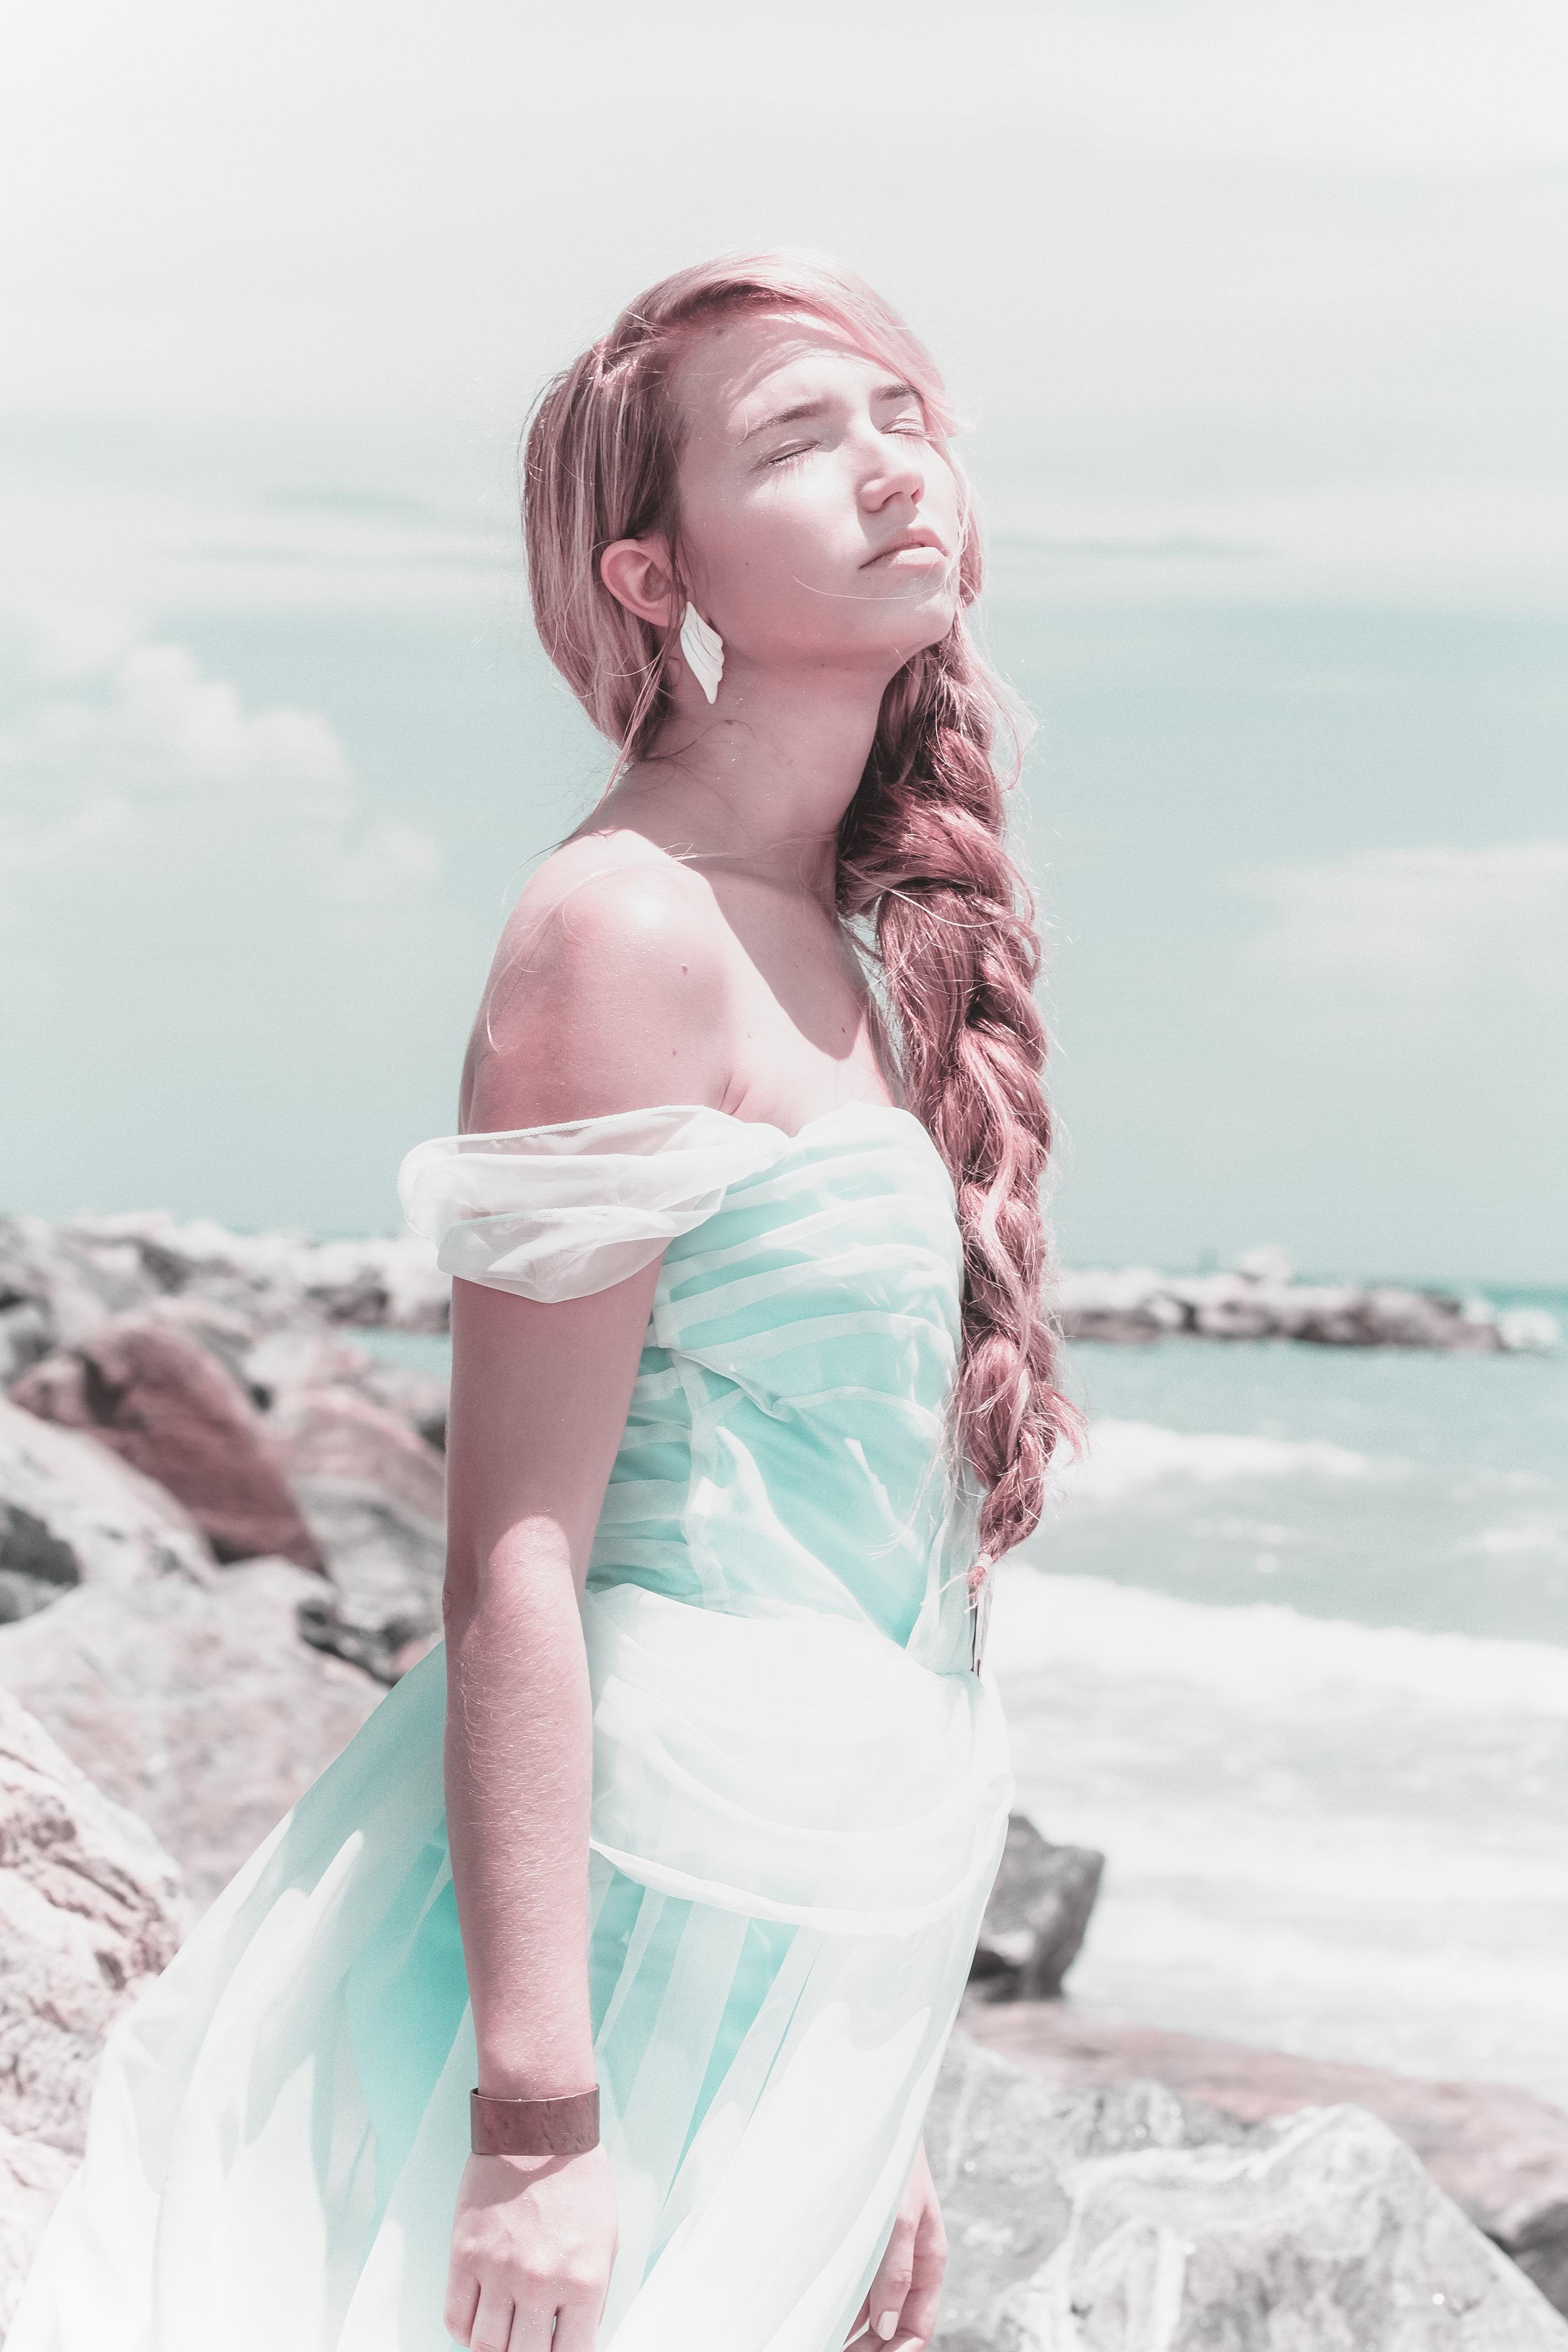 mermaid_desireemarie_vaniaelisephotography--5.jpg